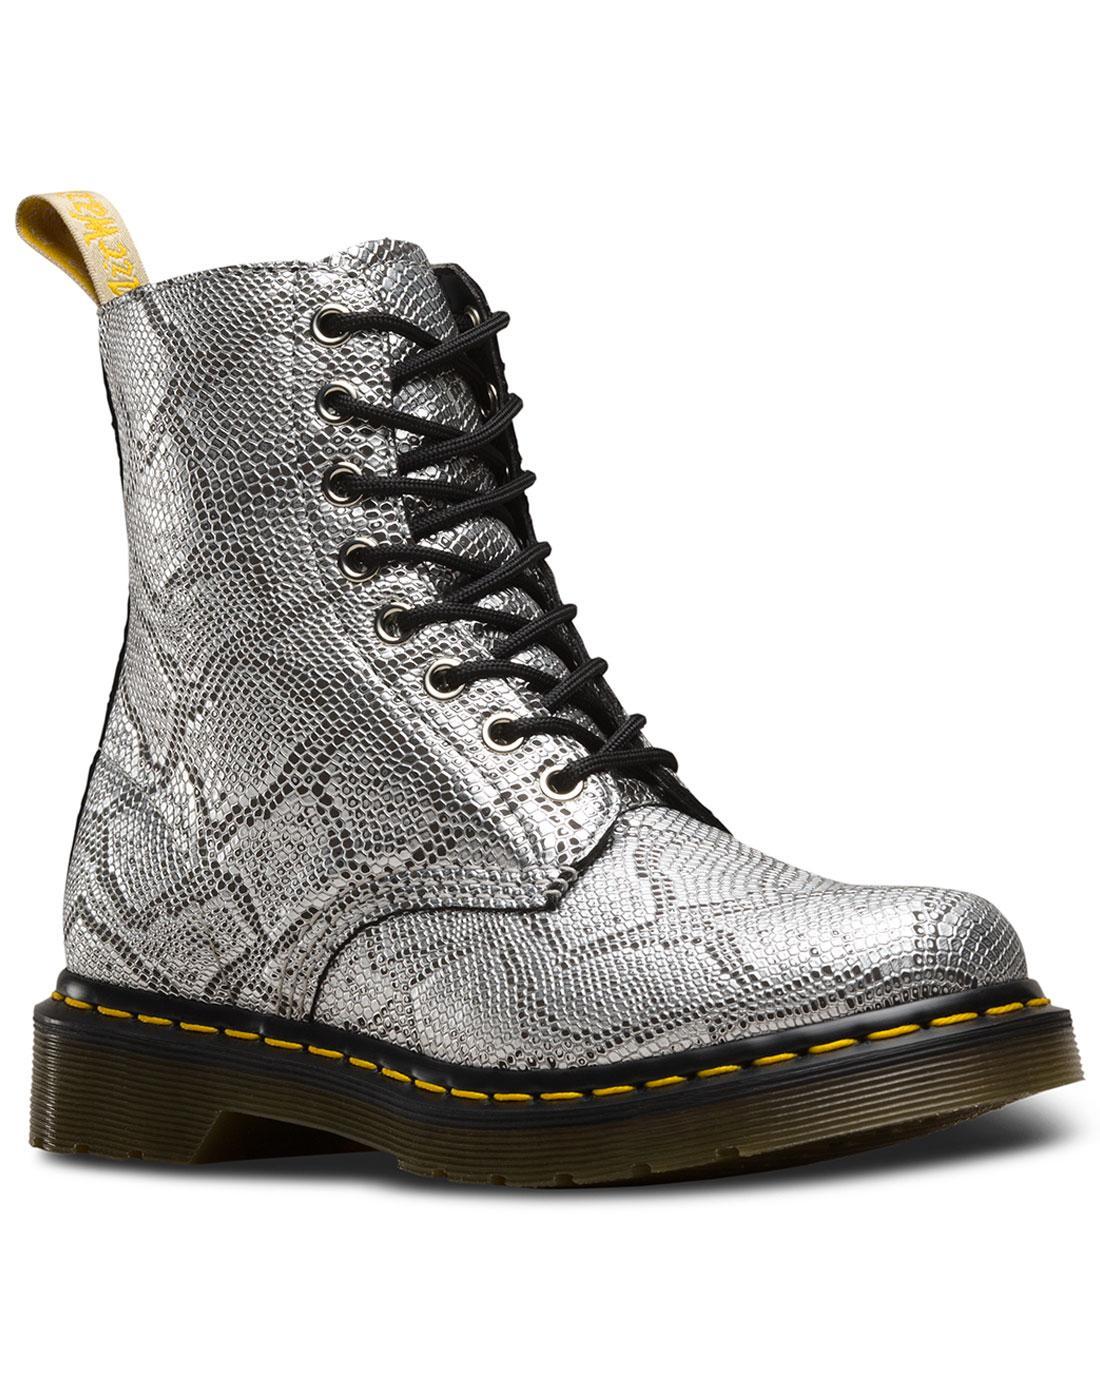 V Pascal DR MARTENS Vegan Metallic Snake Boots